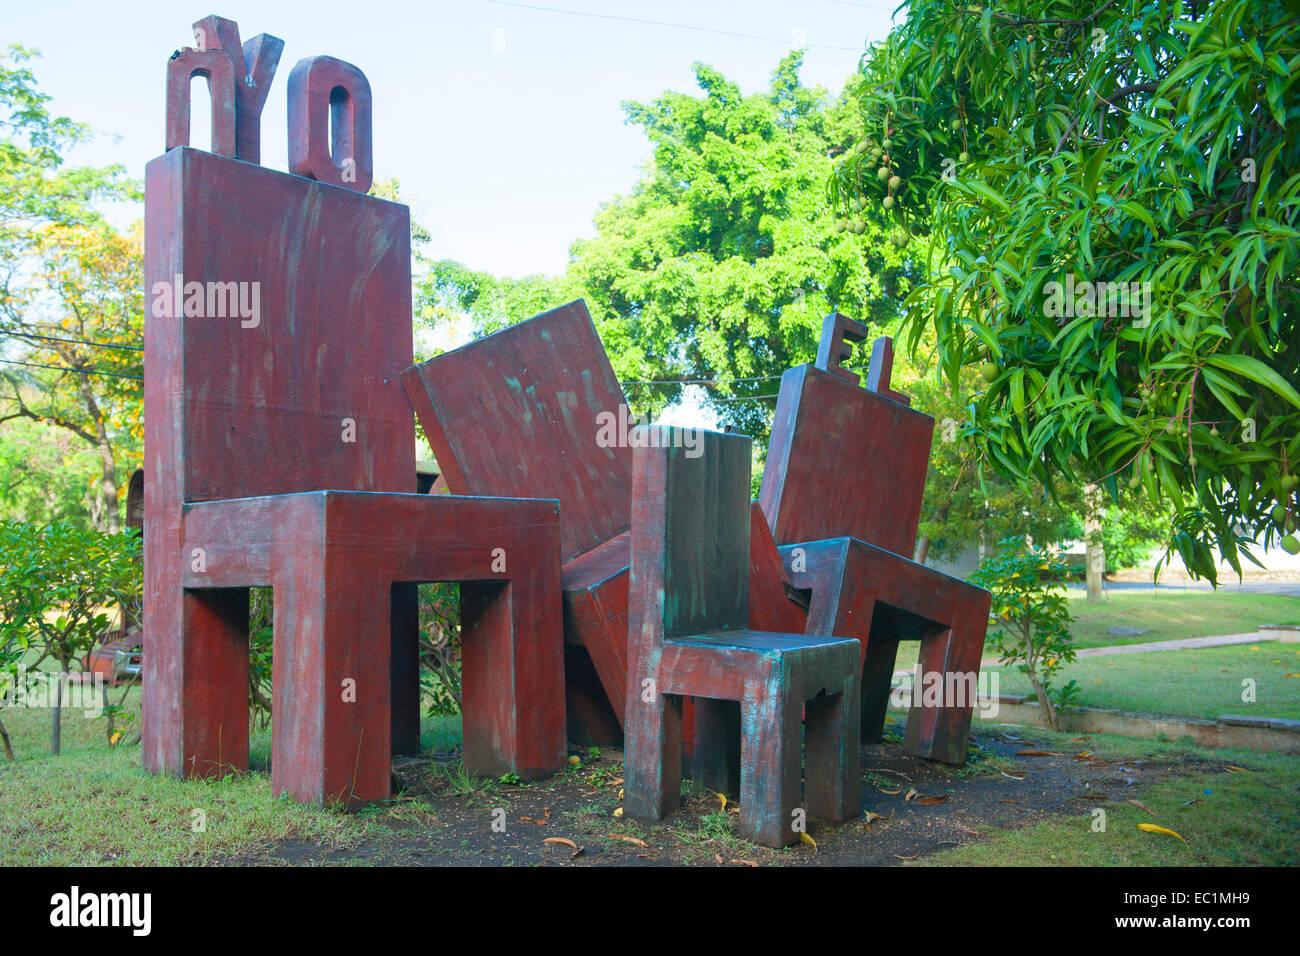 Dominikanische Republik, Santo Domingo, Parque de la Cultura, Skulpturenpark vor dem Museo de Arte Moderno Immagini Stock